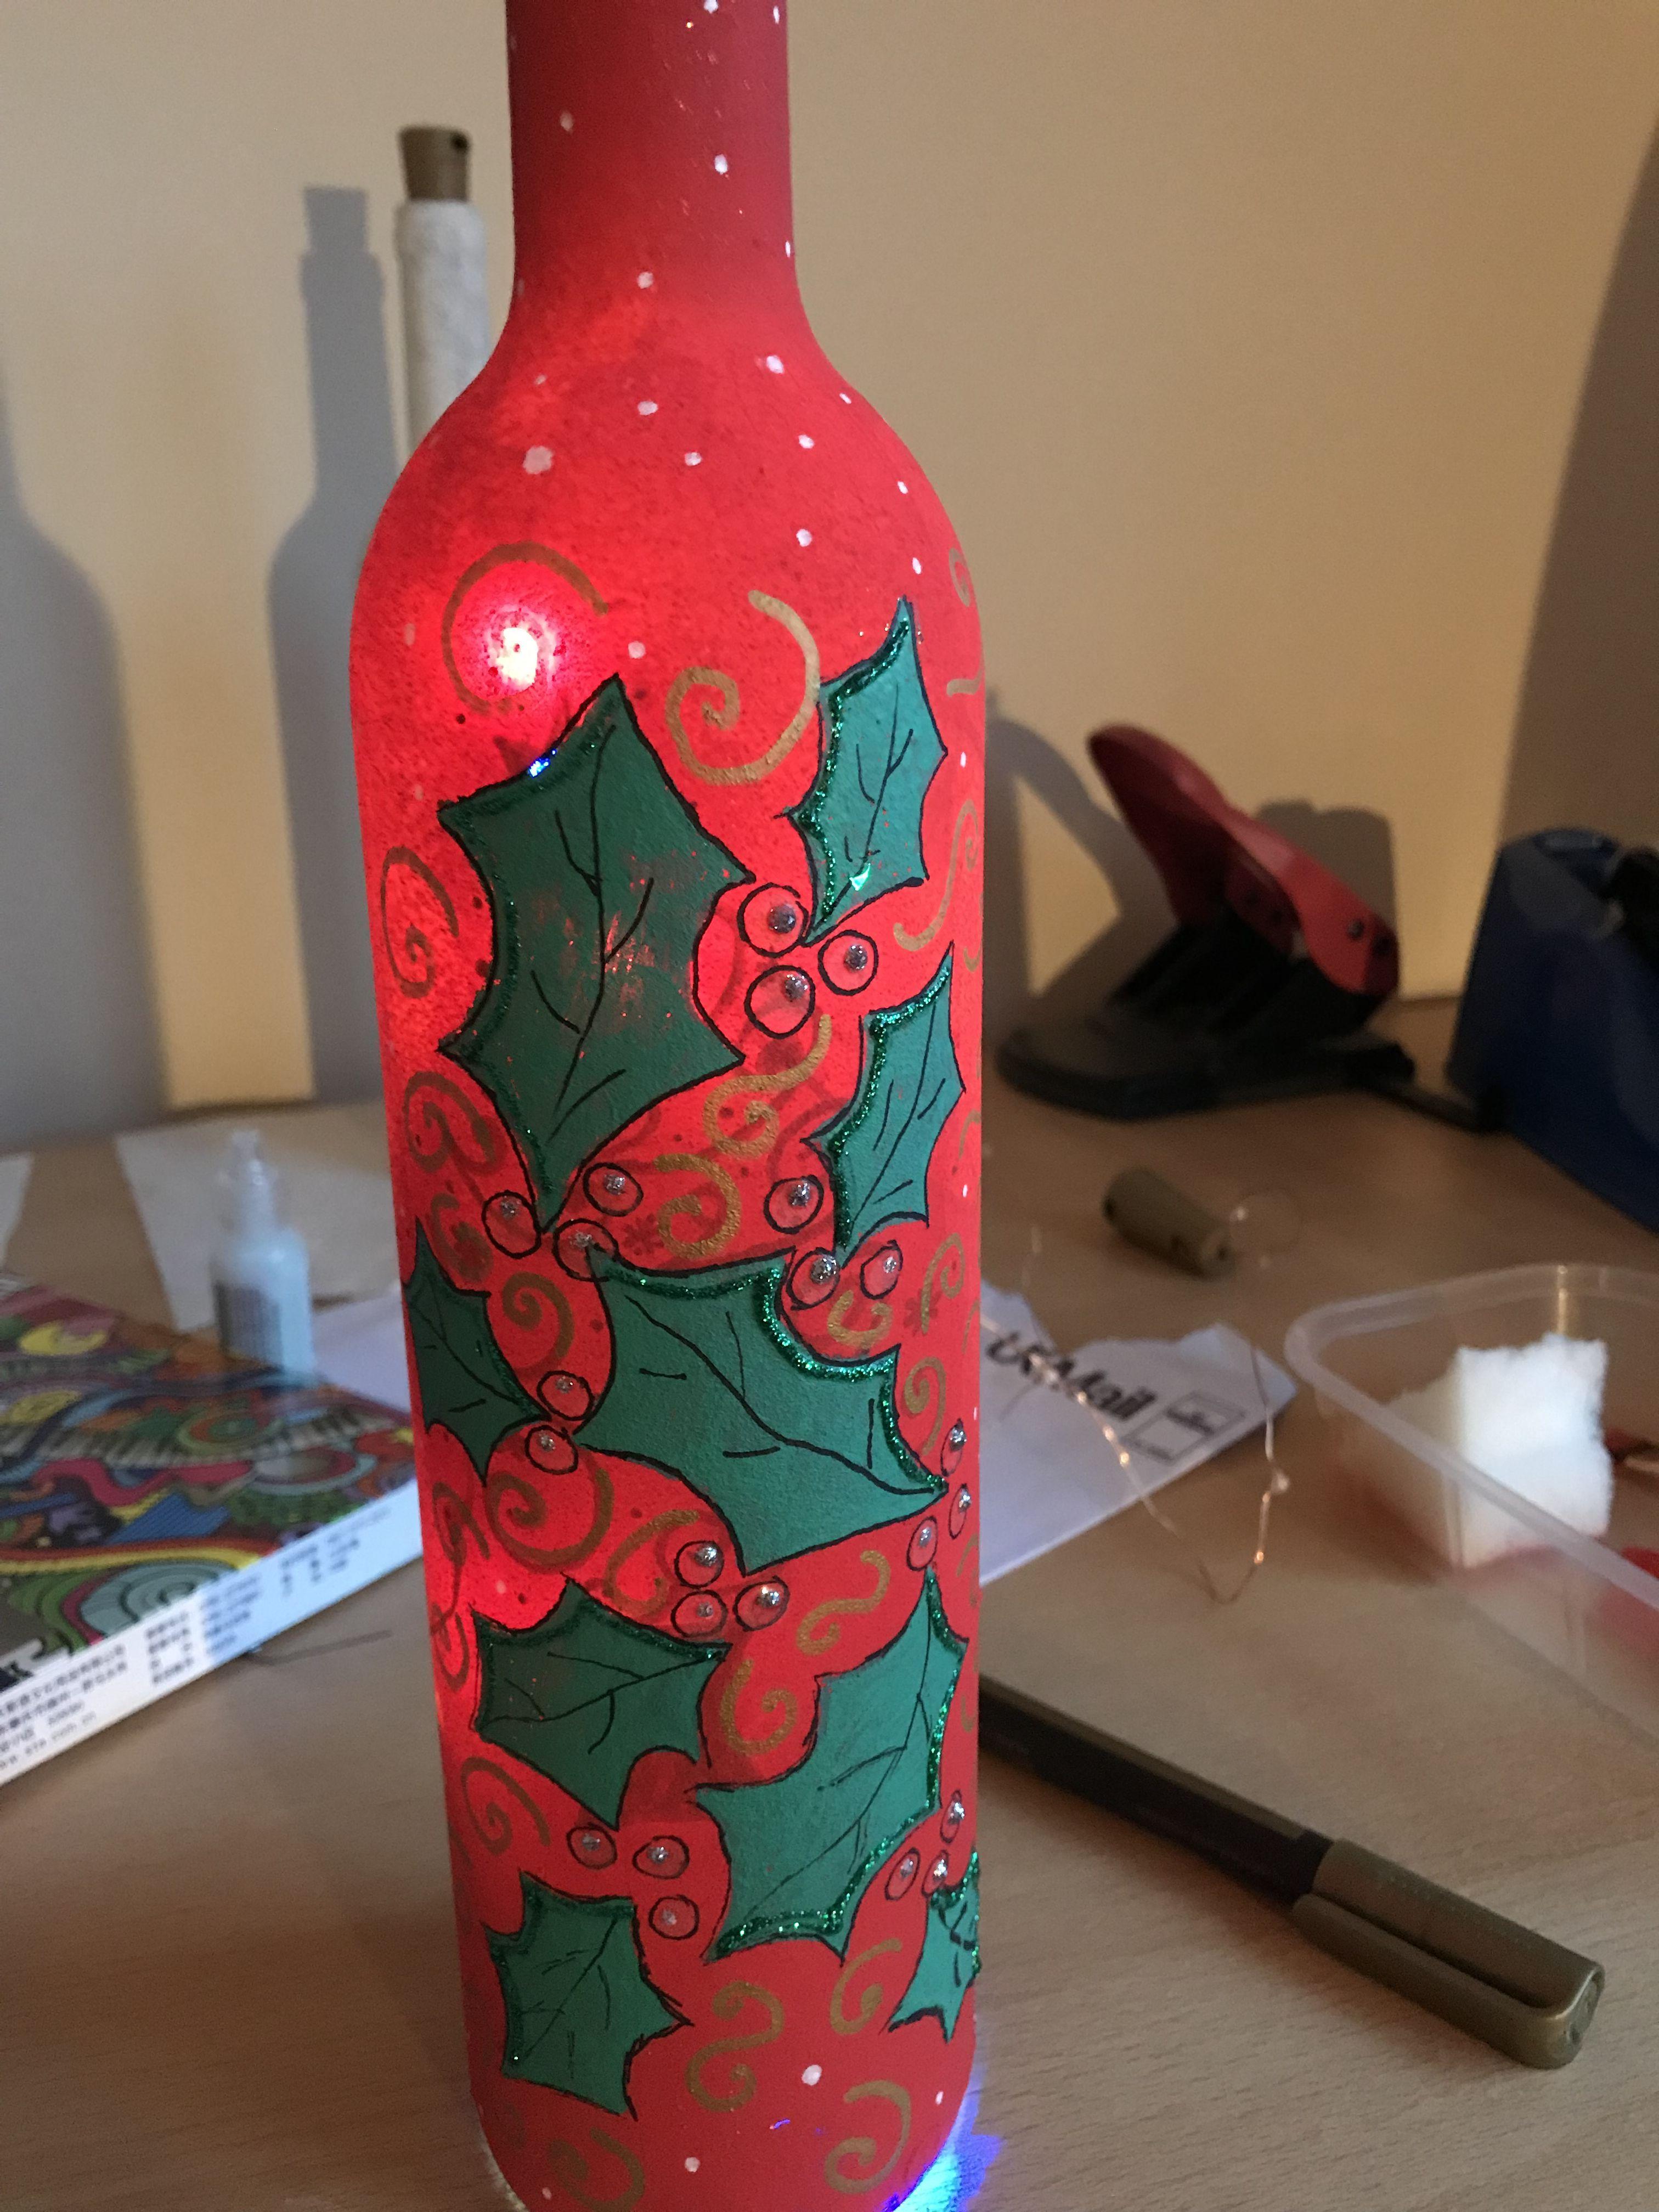 Pin By Esperanza Montano Reyes On Painted Wine Bottles Wine Bottle Crafts Bottles Decoration Painted Wine Bottles